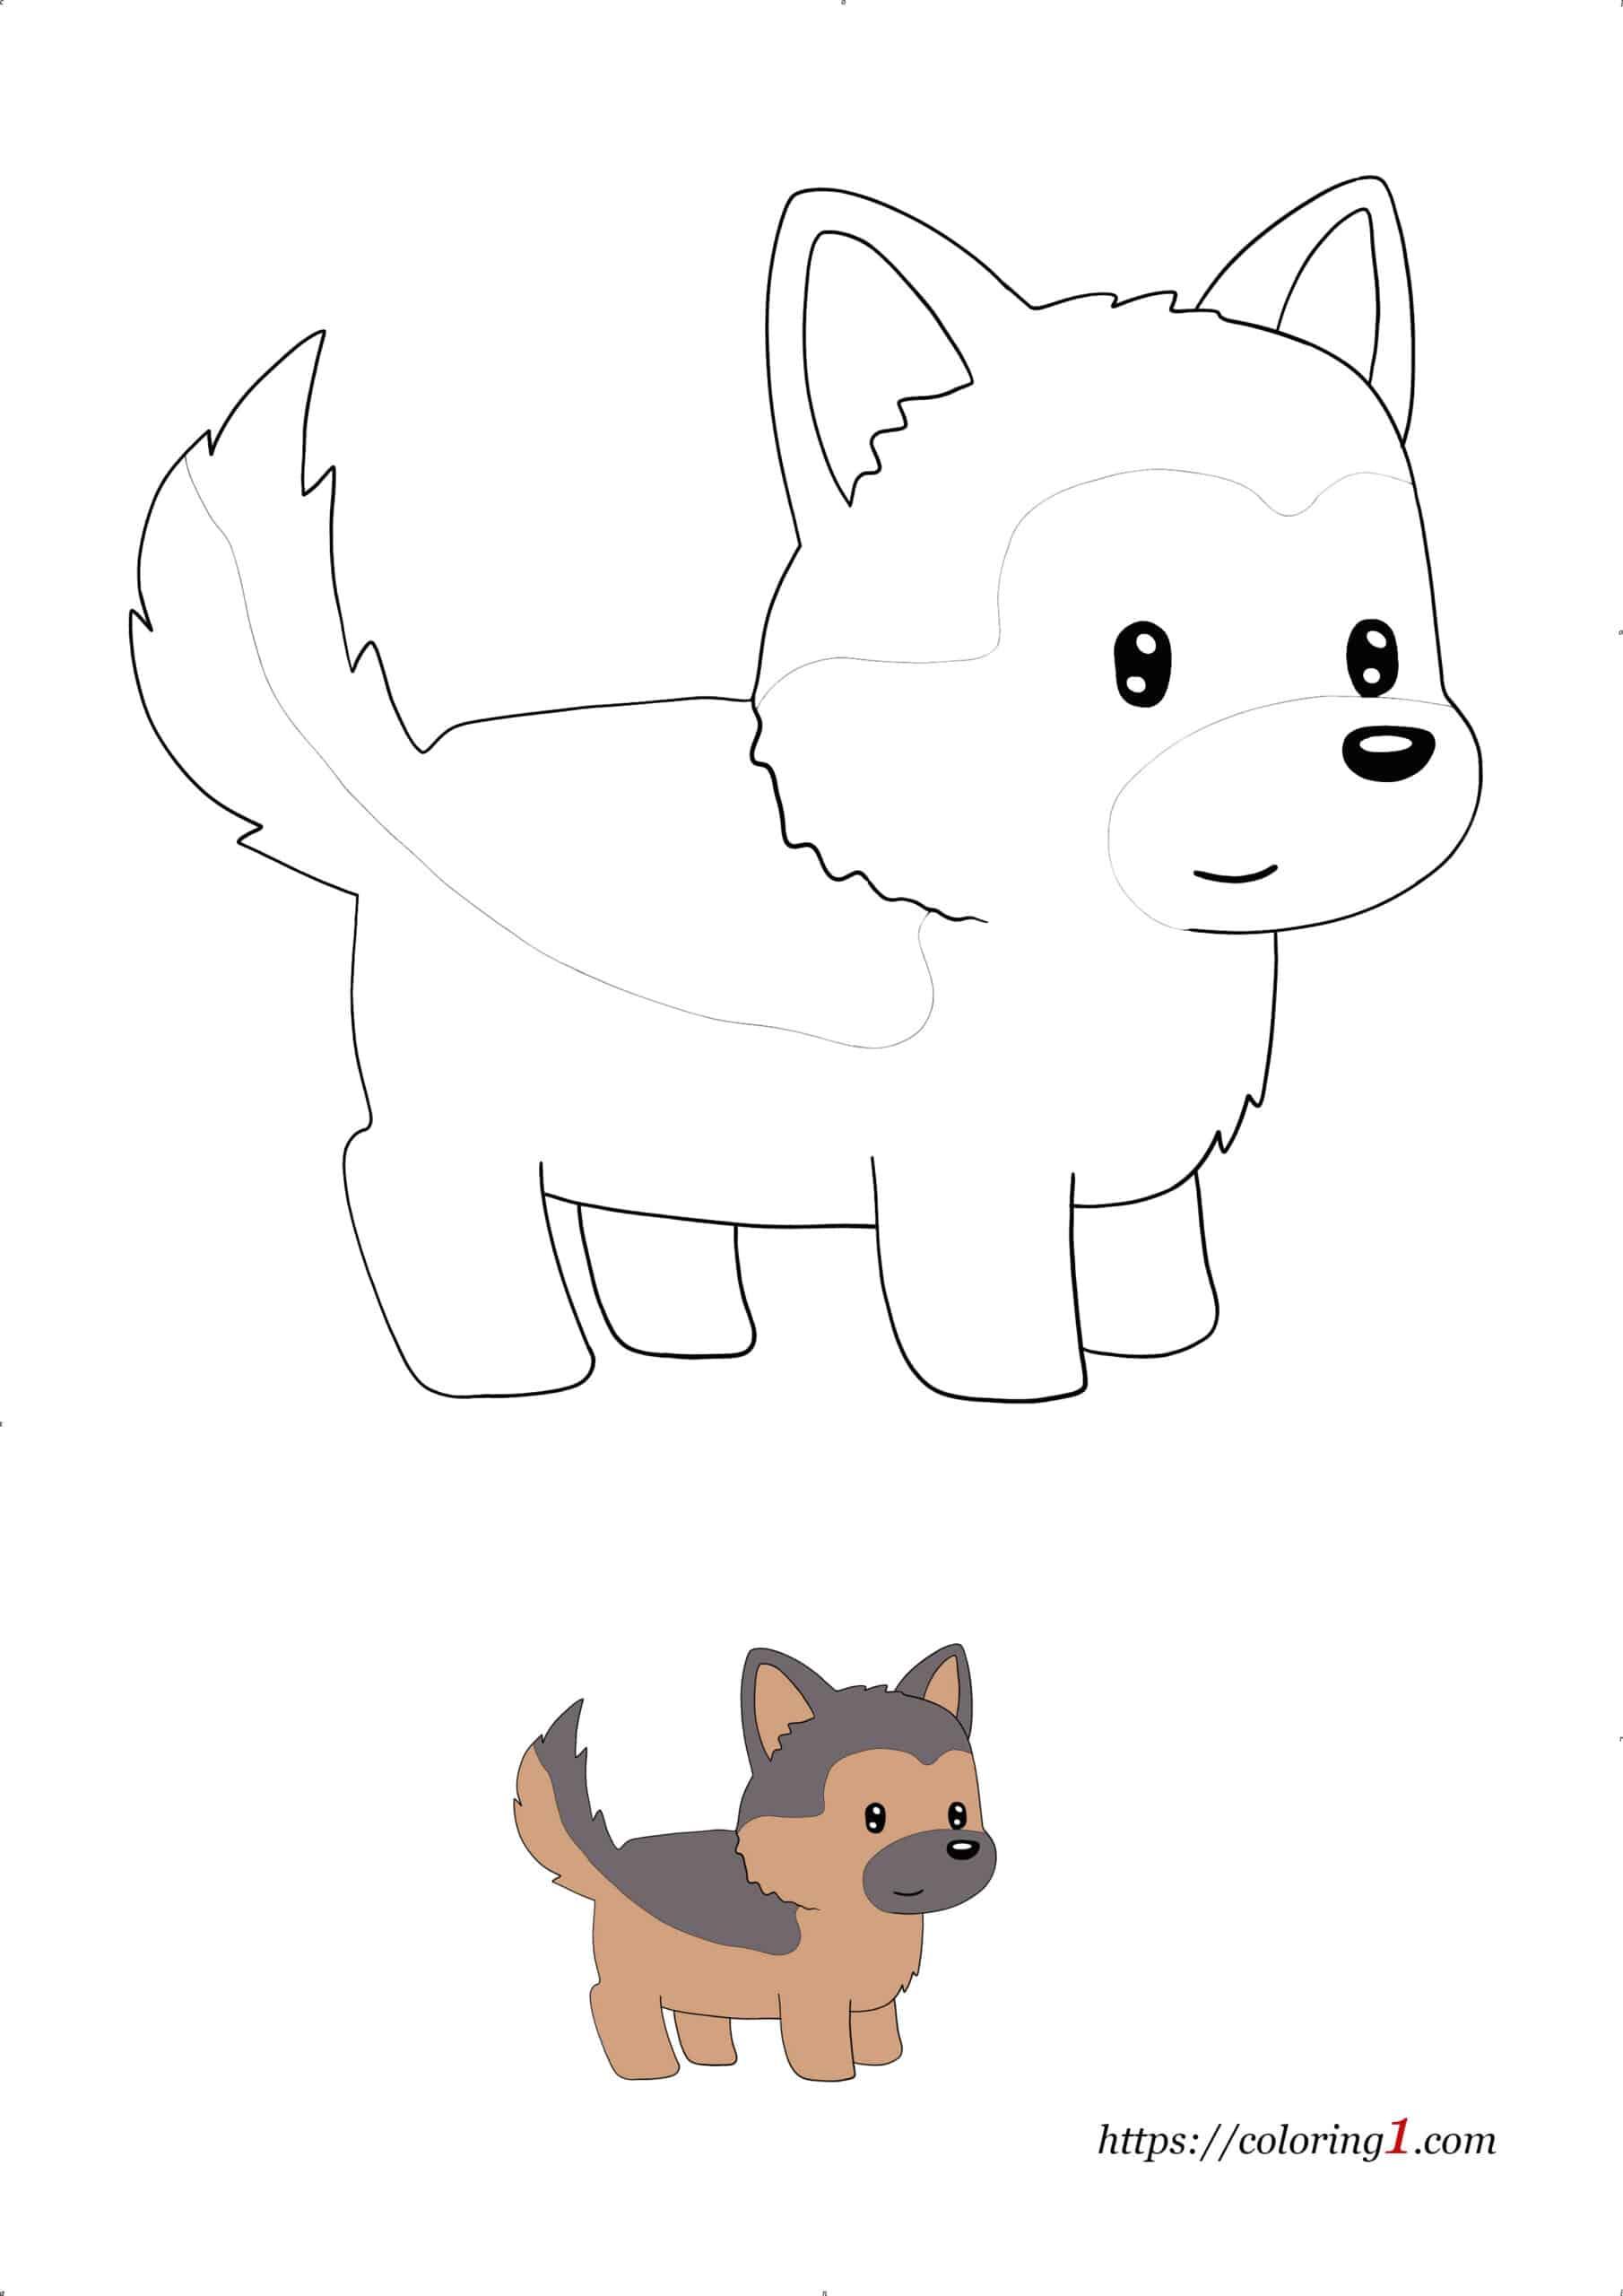 Anime Dog free printable coloring sheet with sample